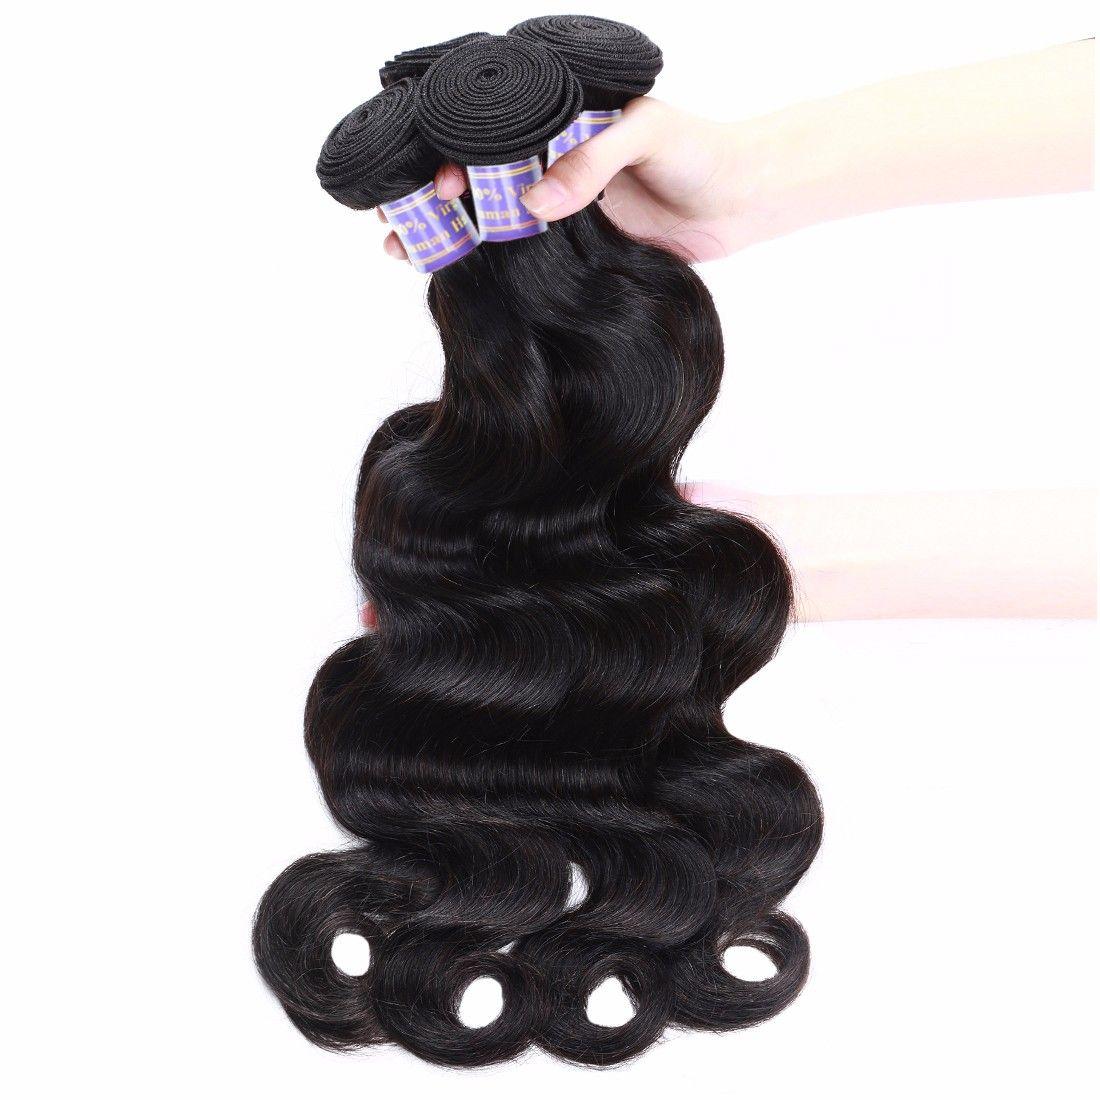 Allove 8A Hair Brazilian Body Wave Hair 3 Bundles  lot Unprocessed Human Hair Extensions Brazilian Virgin Hair Body Weave 1B #Brazilianvirginhair #virginhair